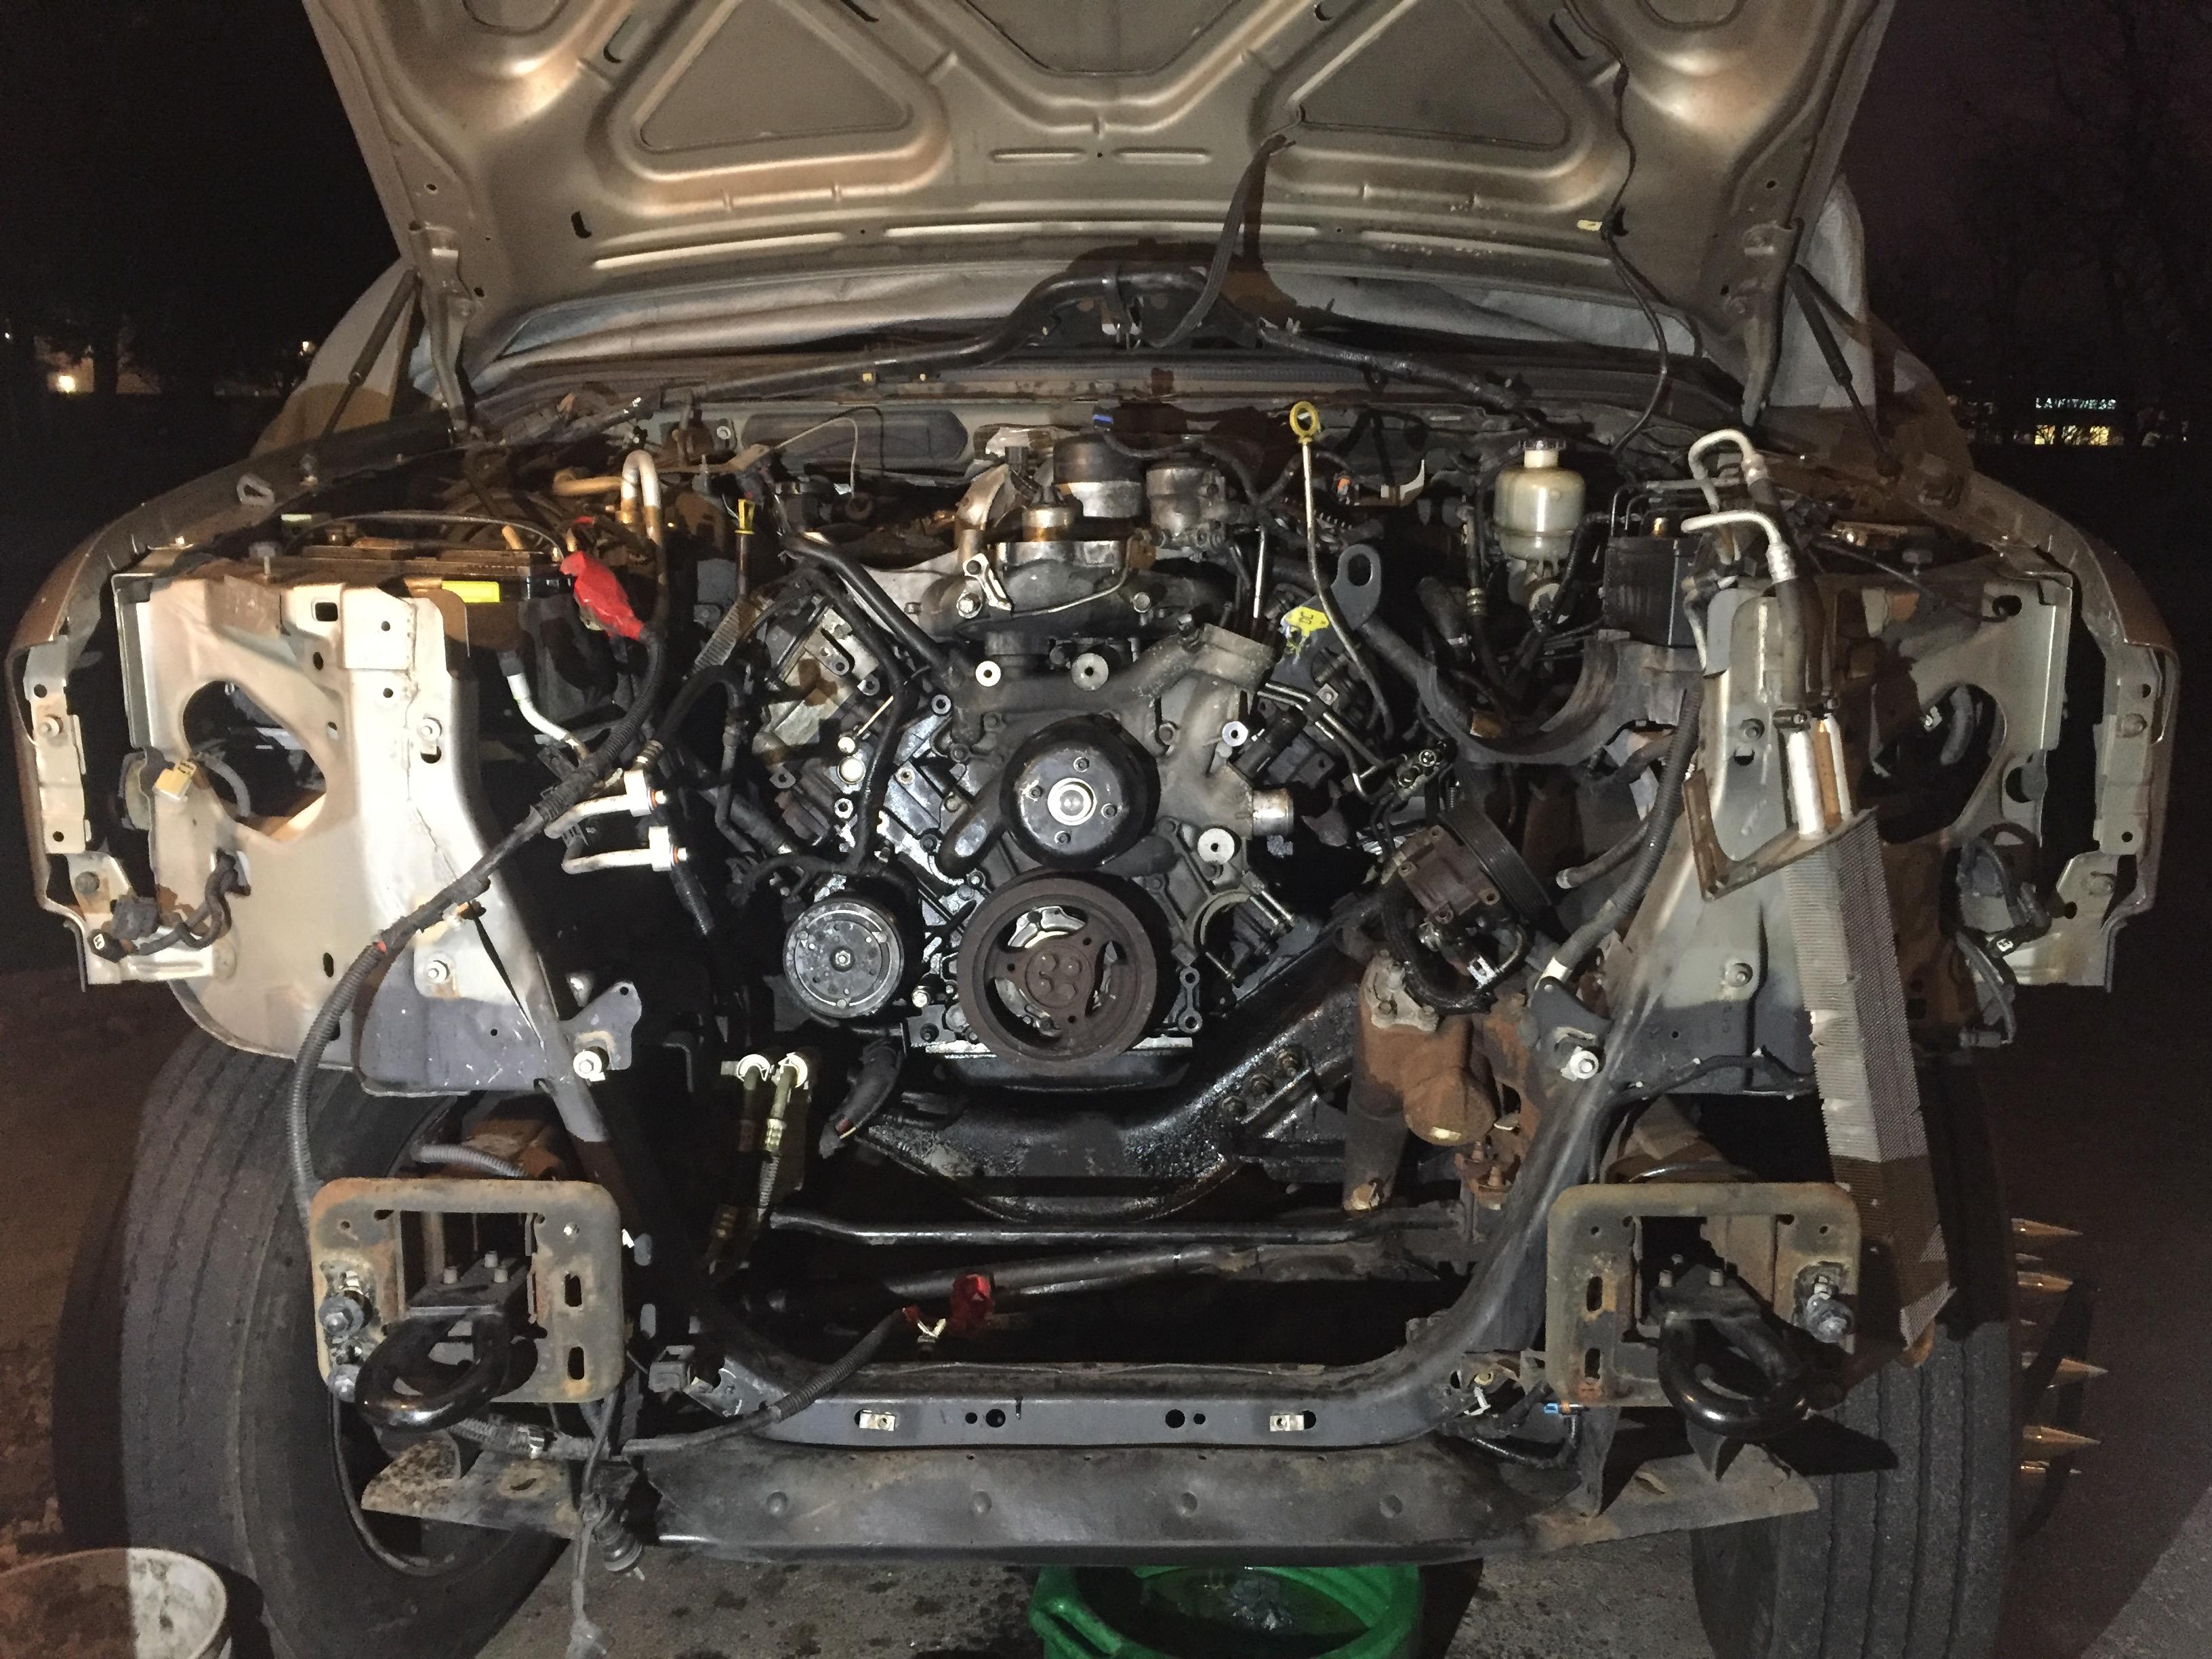 Bed plate leaking???? - Page 3 - Ford Powerstroke Diesel Forum